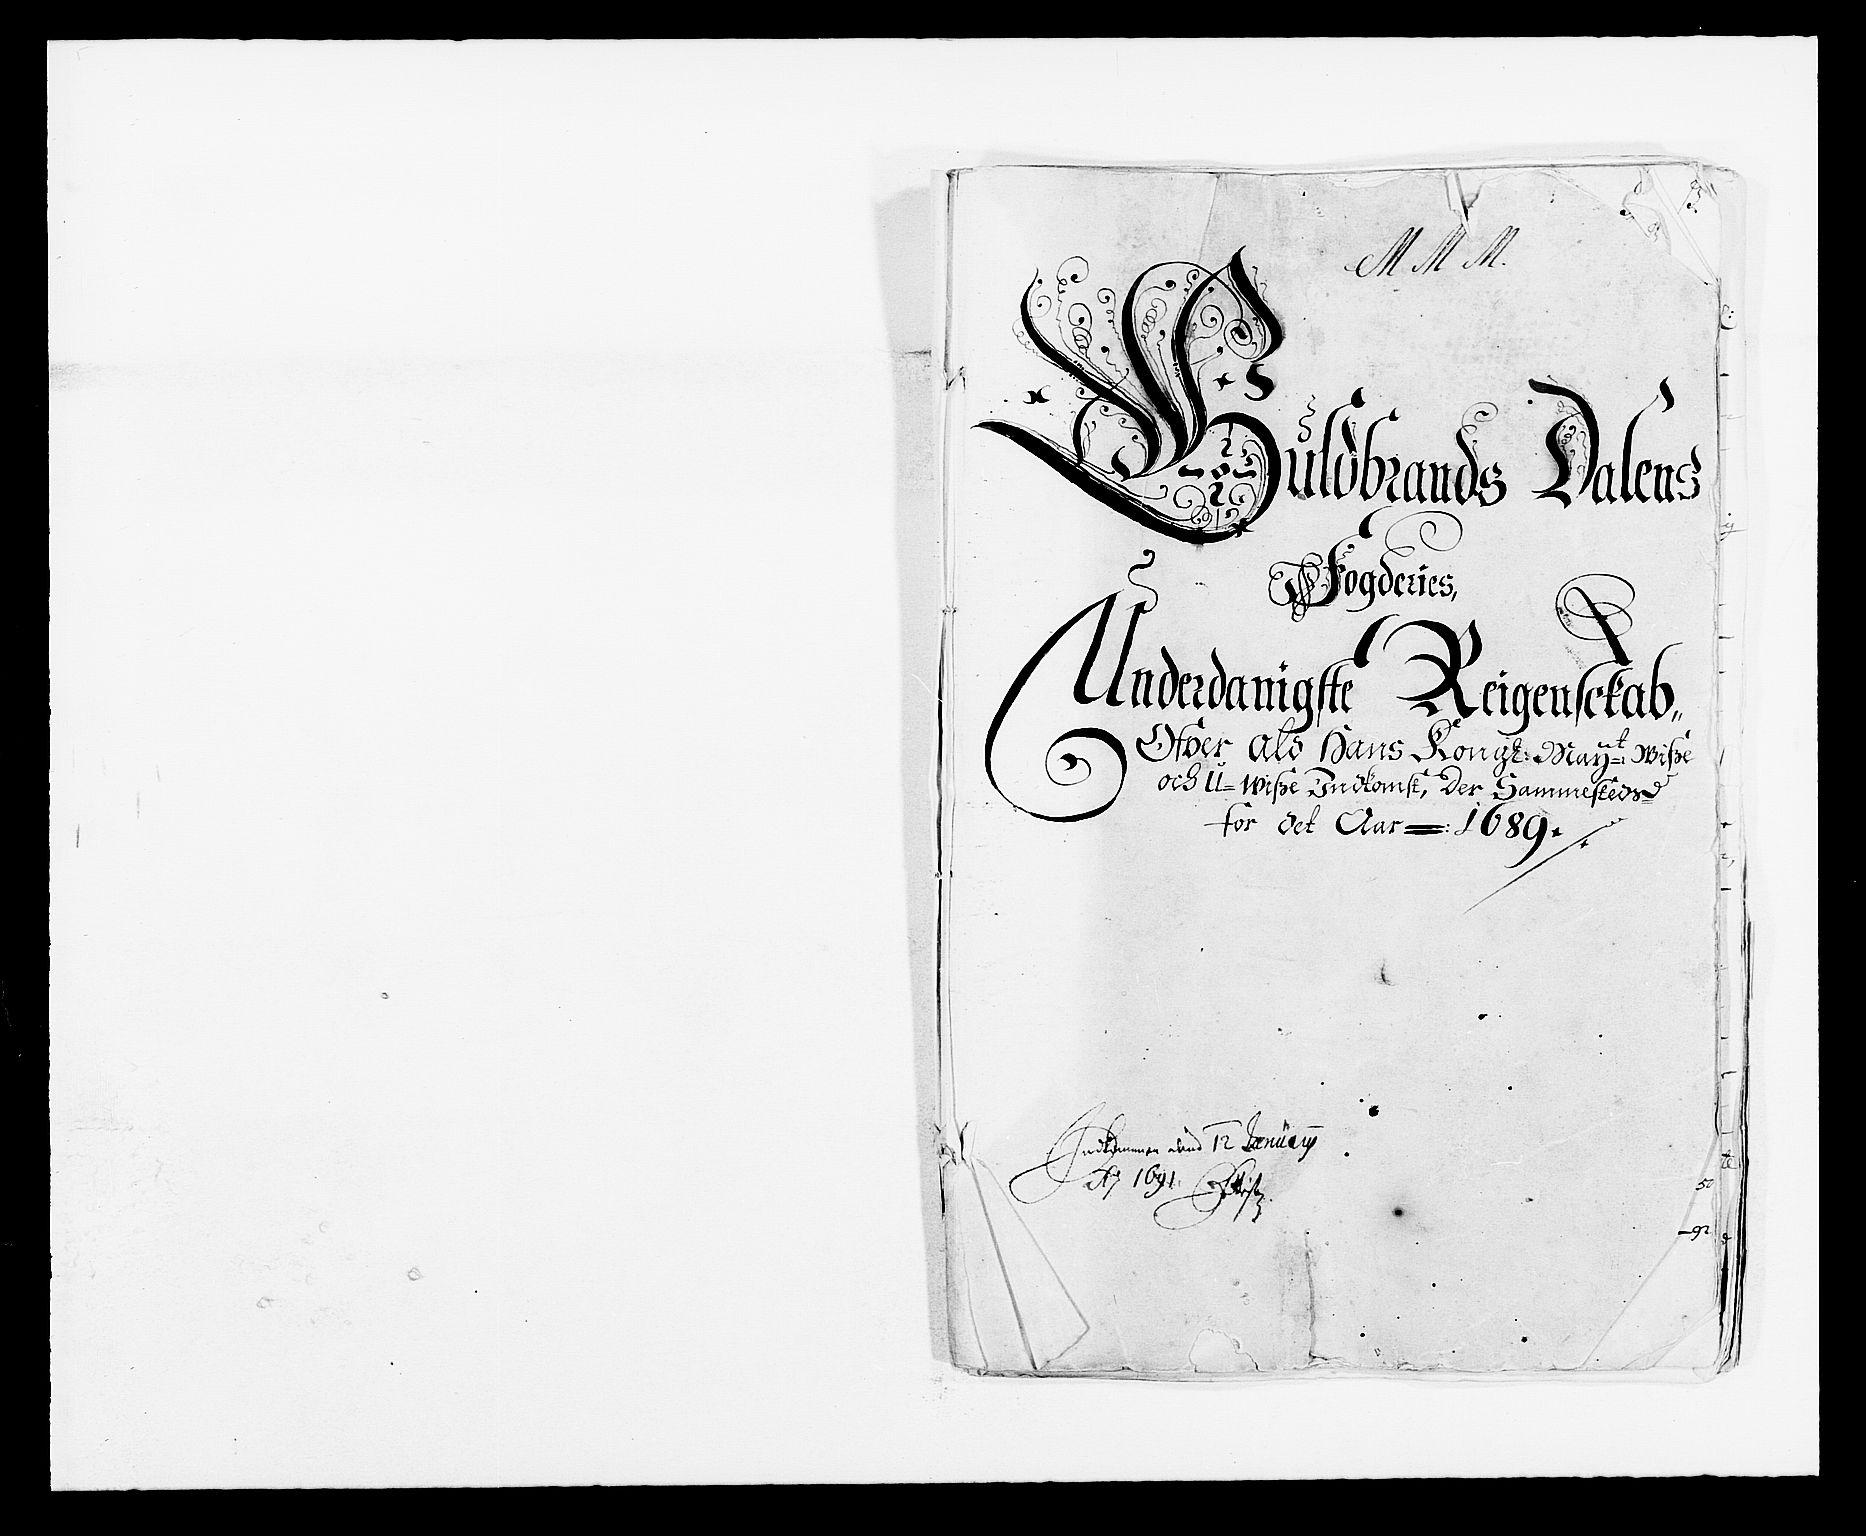 RA, Rentekammeret inntil 1814, Reviderte regnskaper, Fogderegnskap, R17/L1164: Fogderegnskap Gudbrandsdal, 1682-1689, s. 1